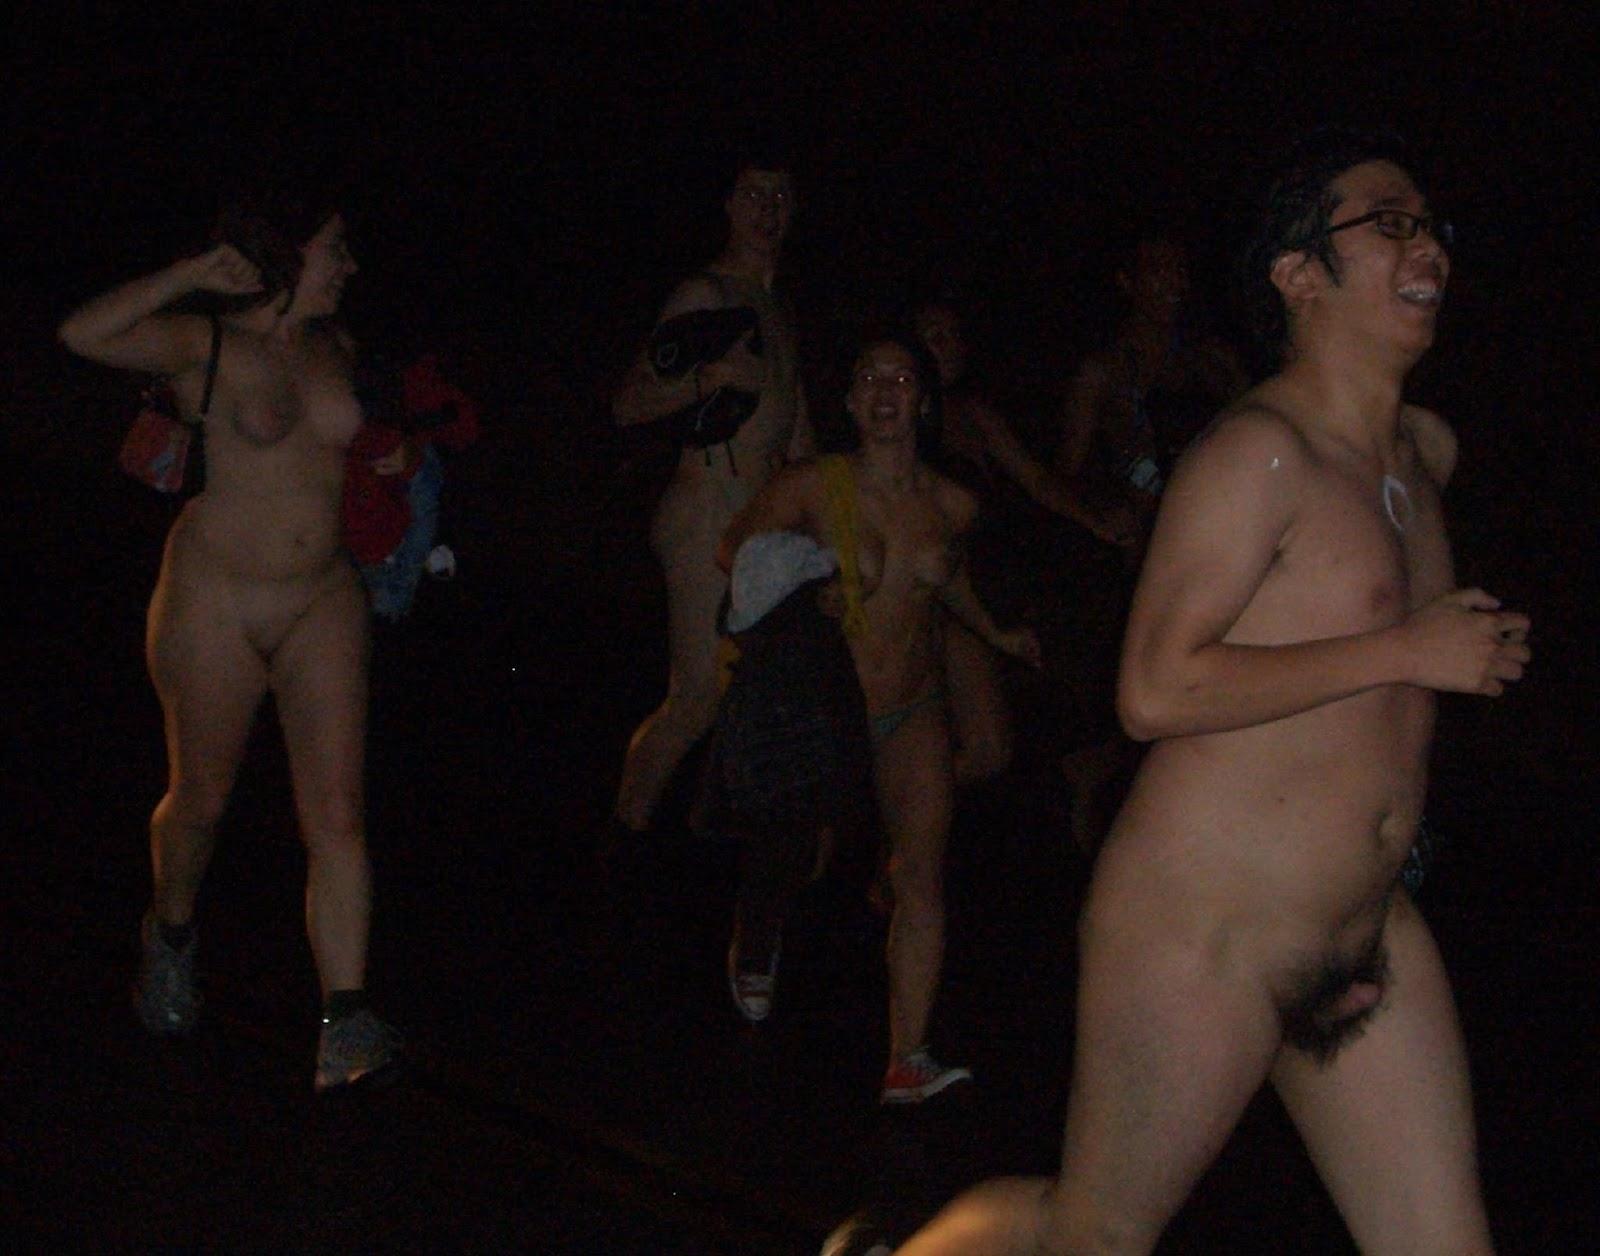 ucsc first rain nude pics endorse Exoplanet